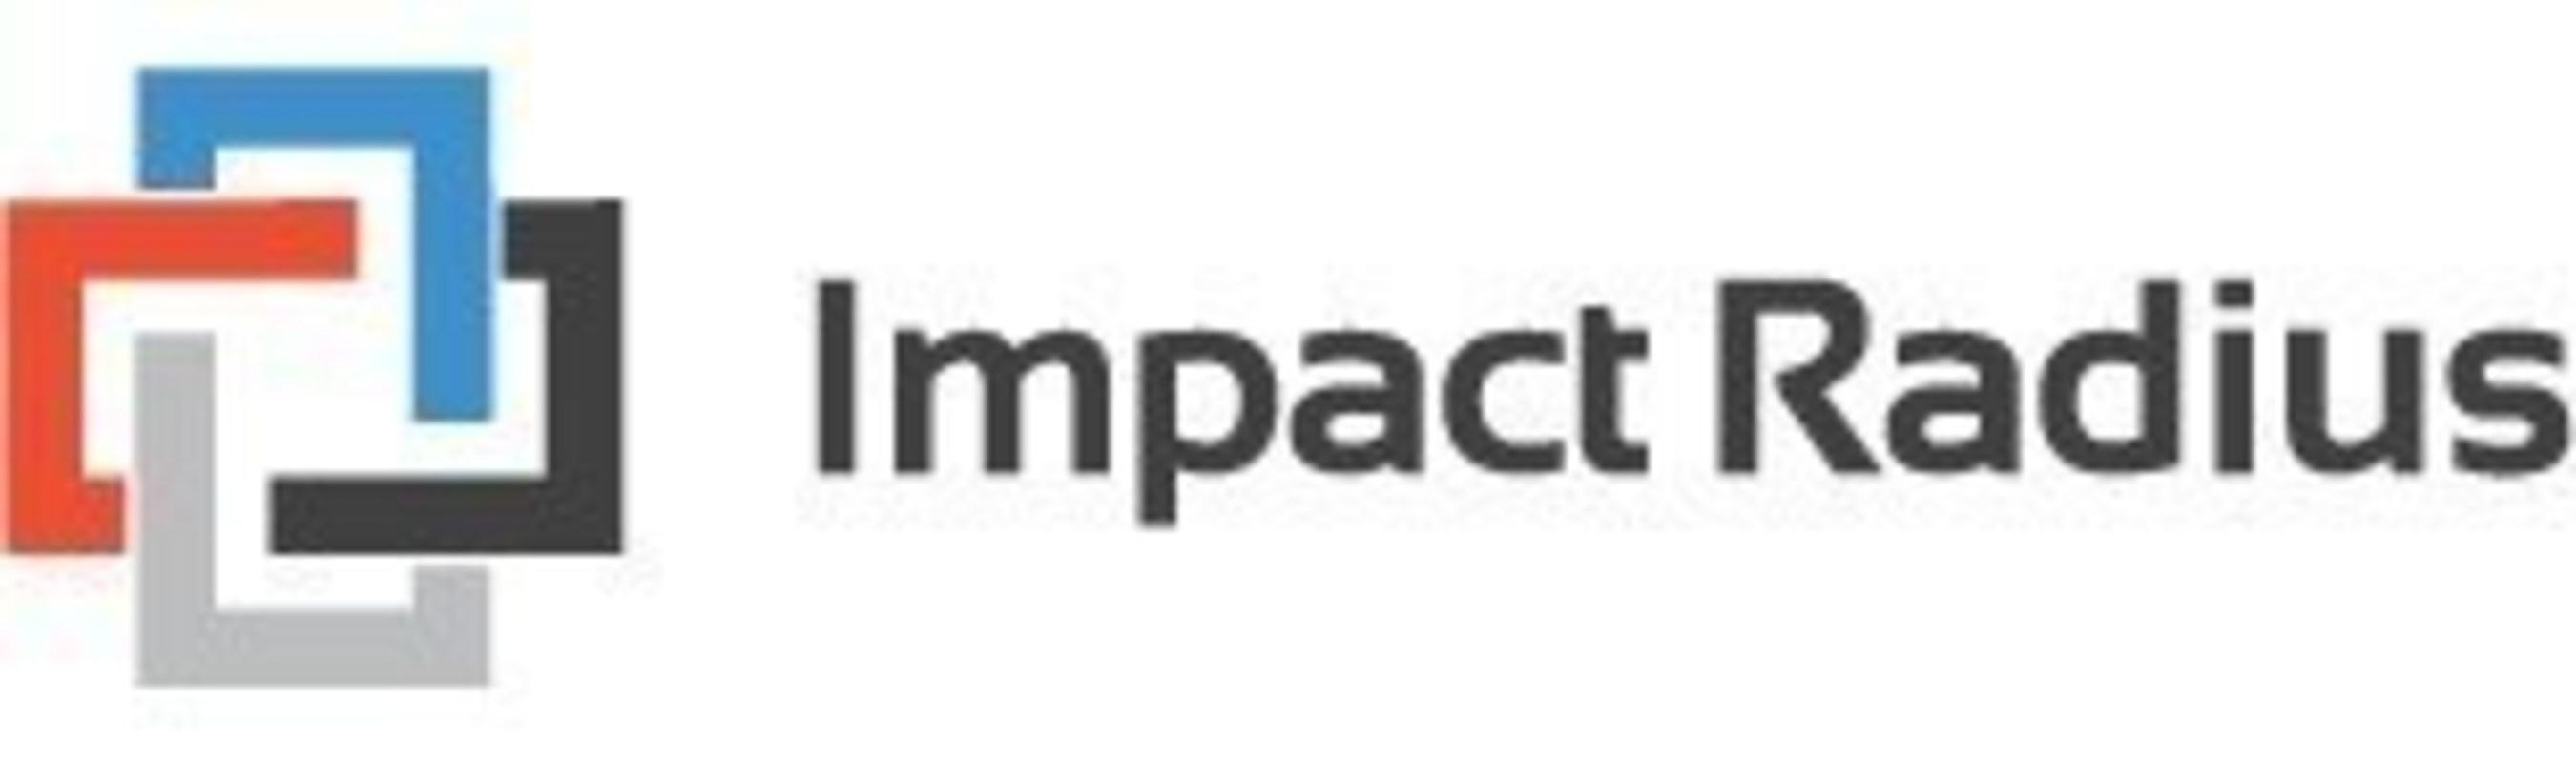 Impact Radius Ranks No. 112 on the Inc. 5000 America's Fastest-Growing Private Companies